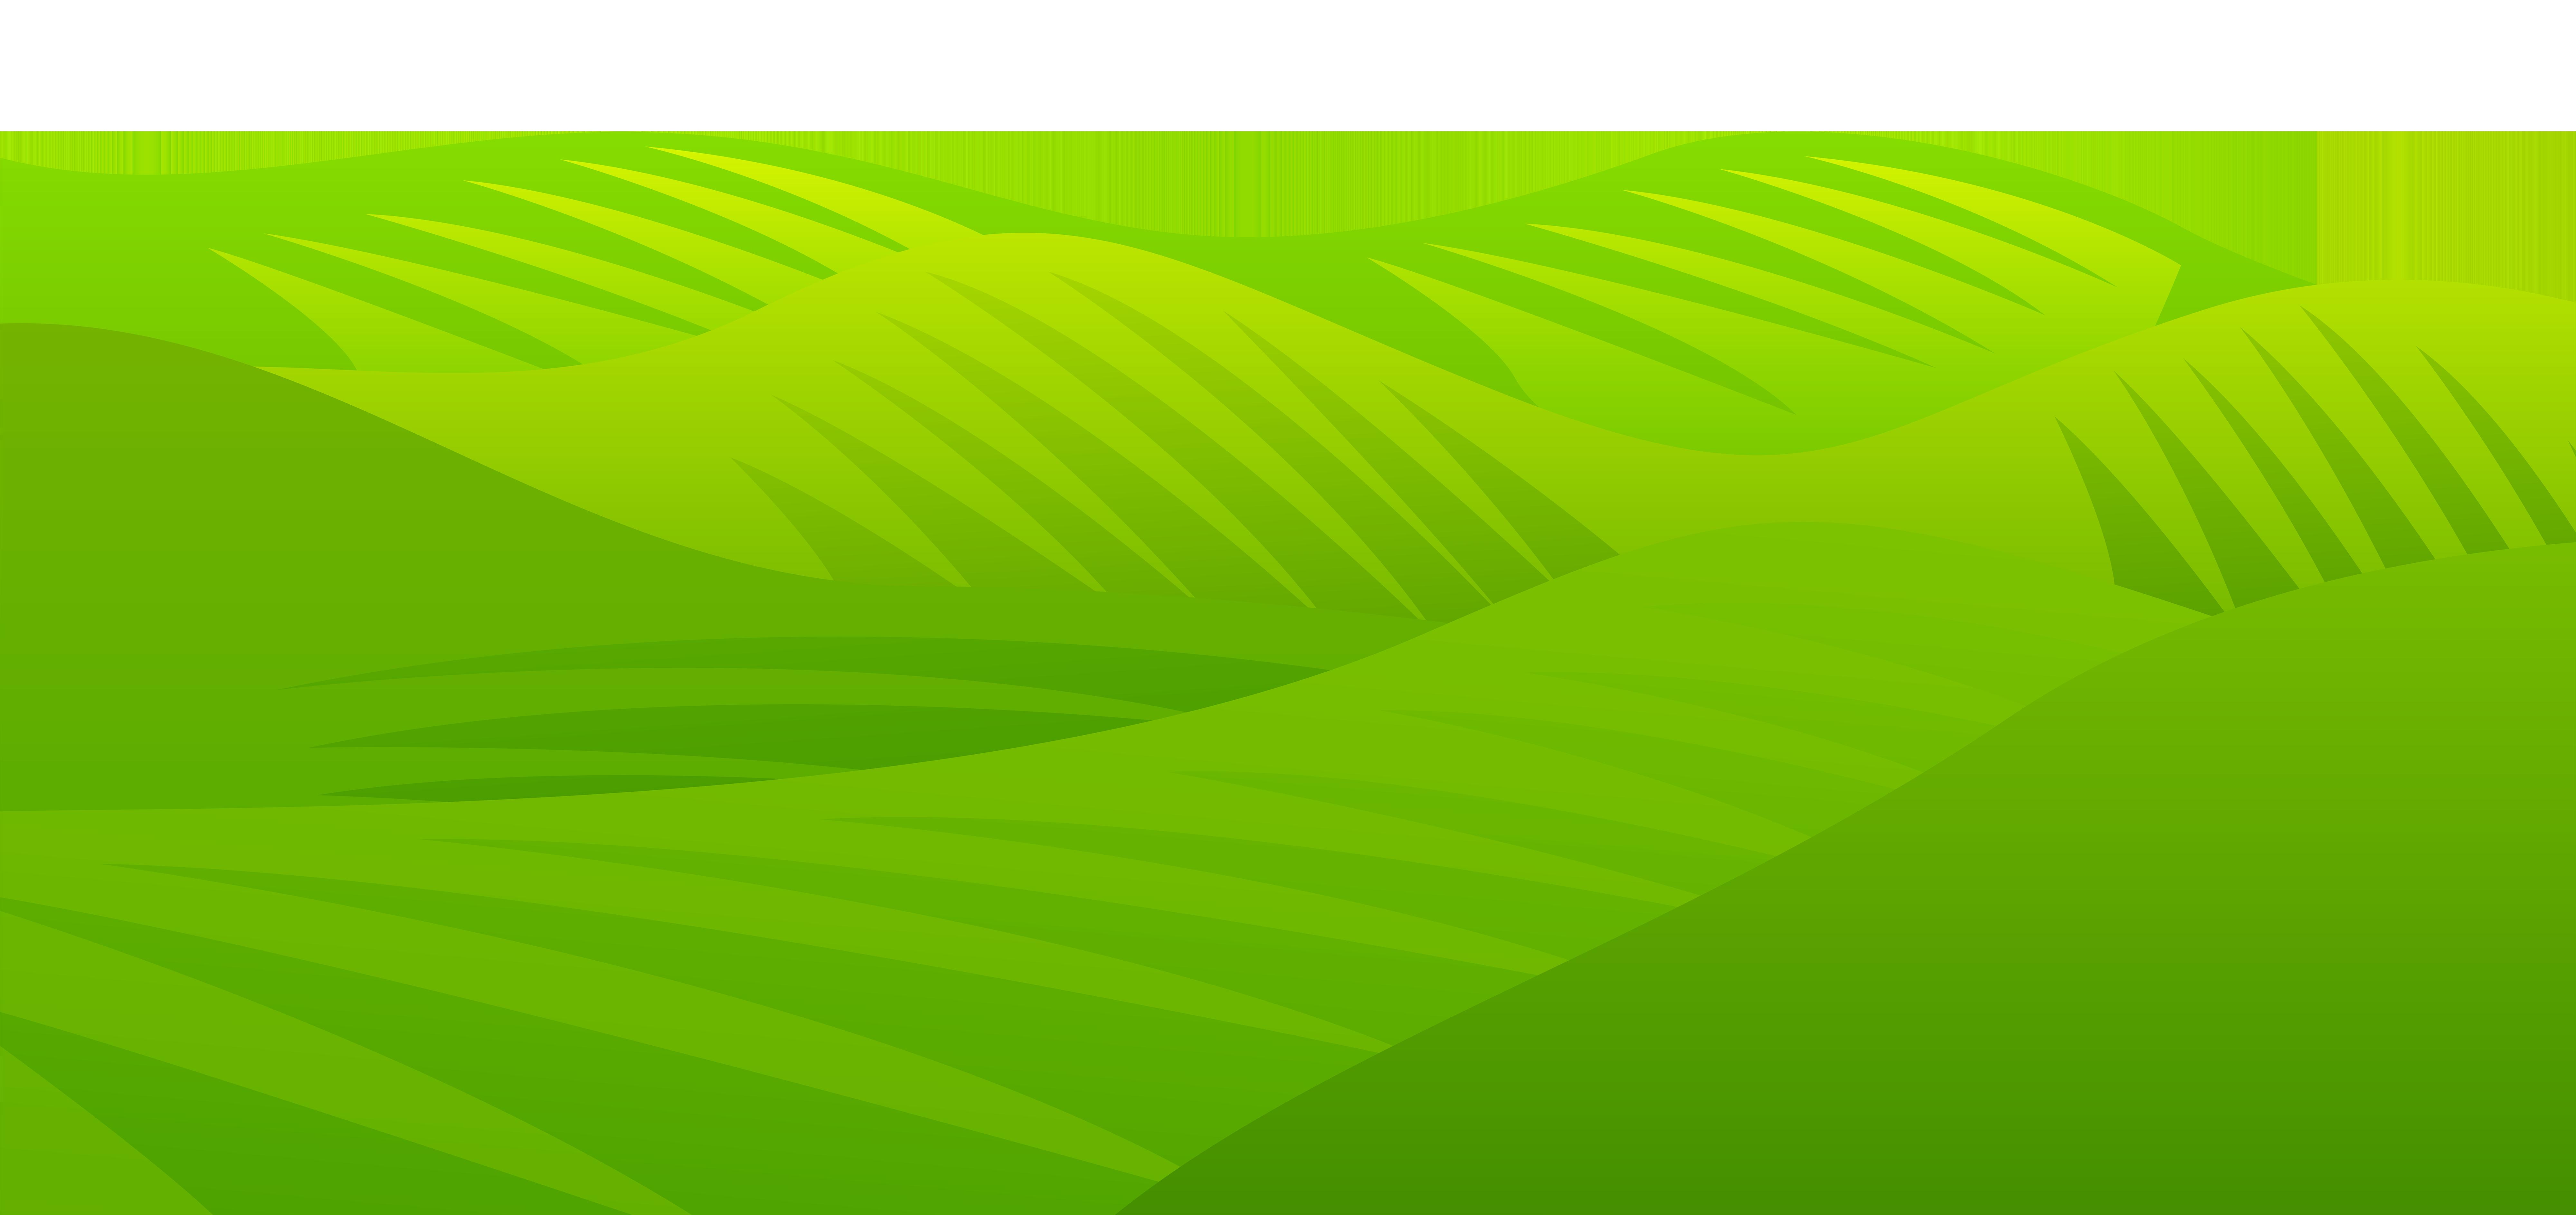 Grass Meadow Transparent PNG Clip Art Image.